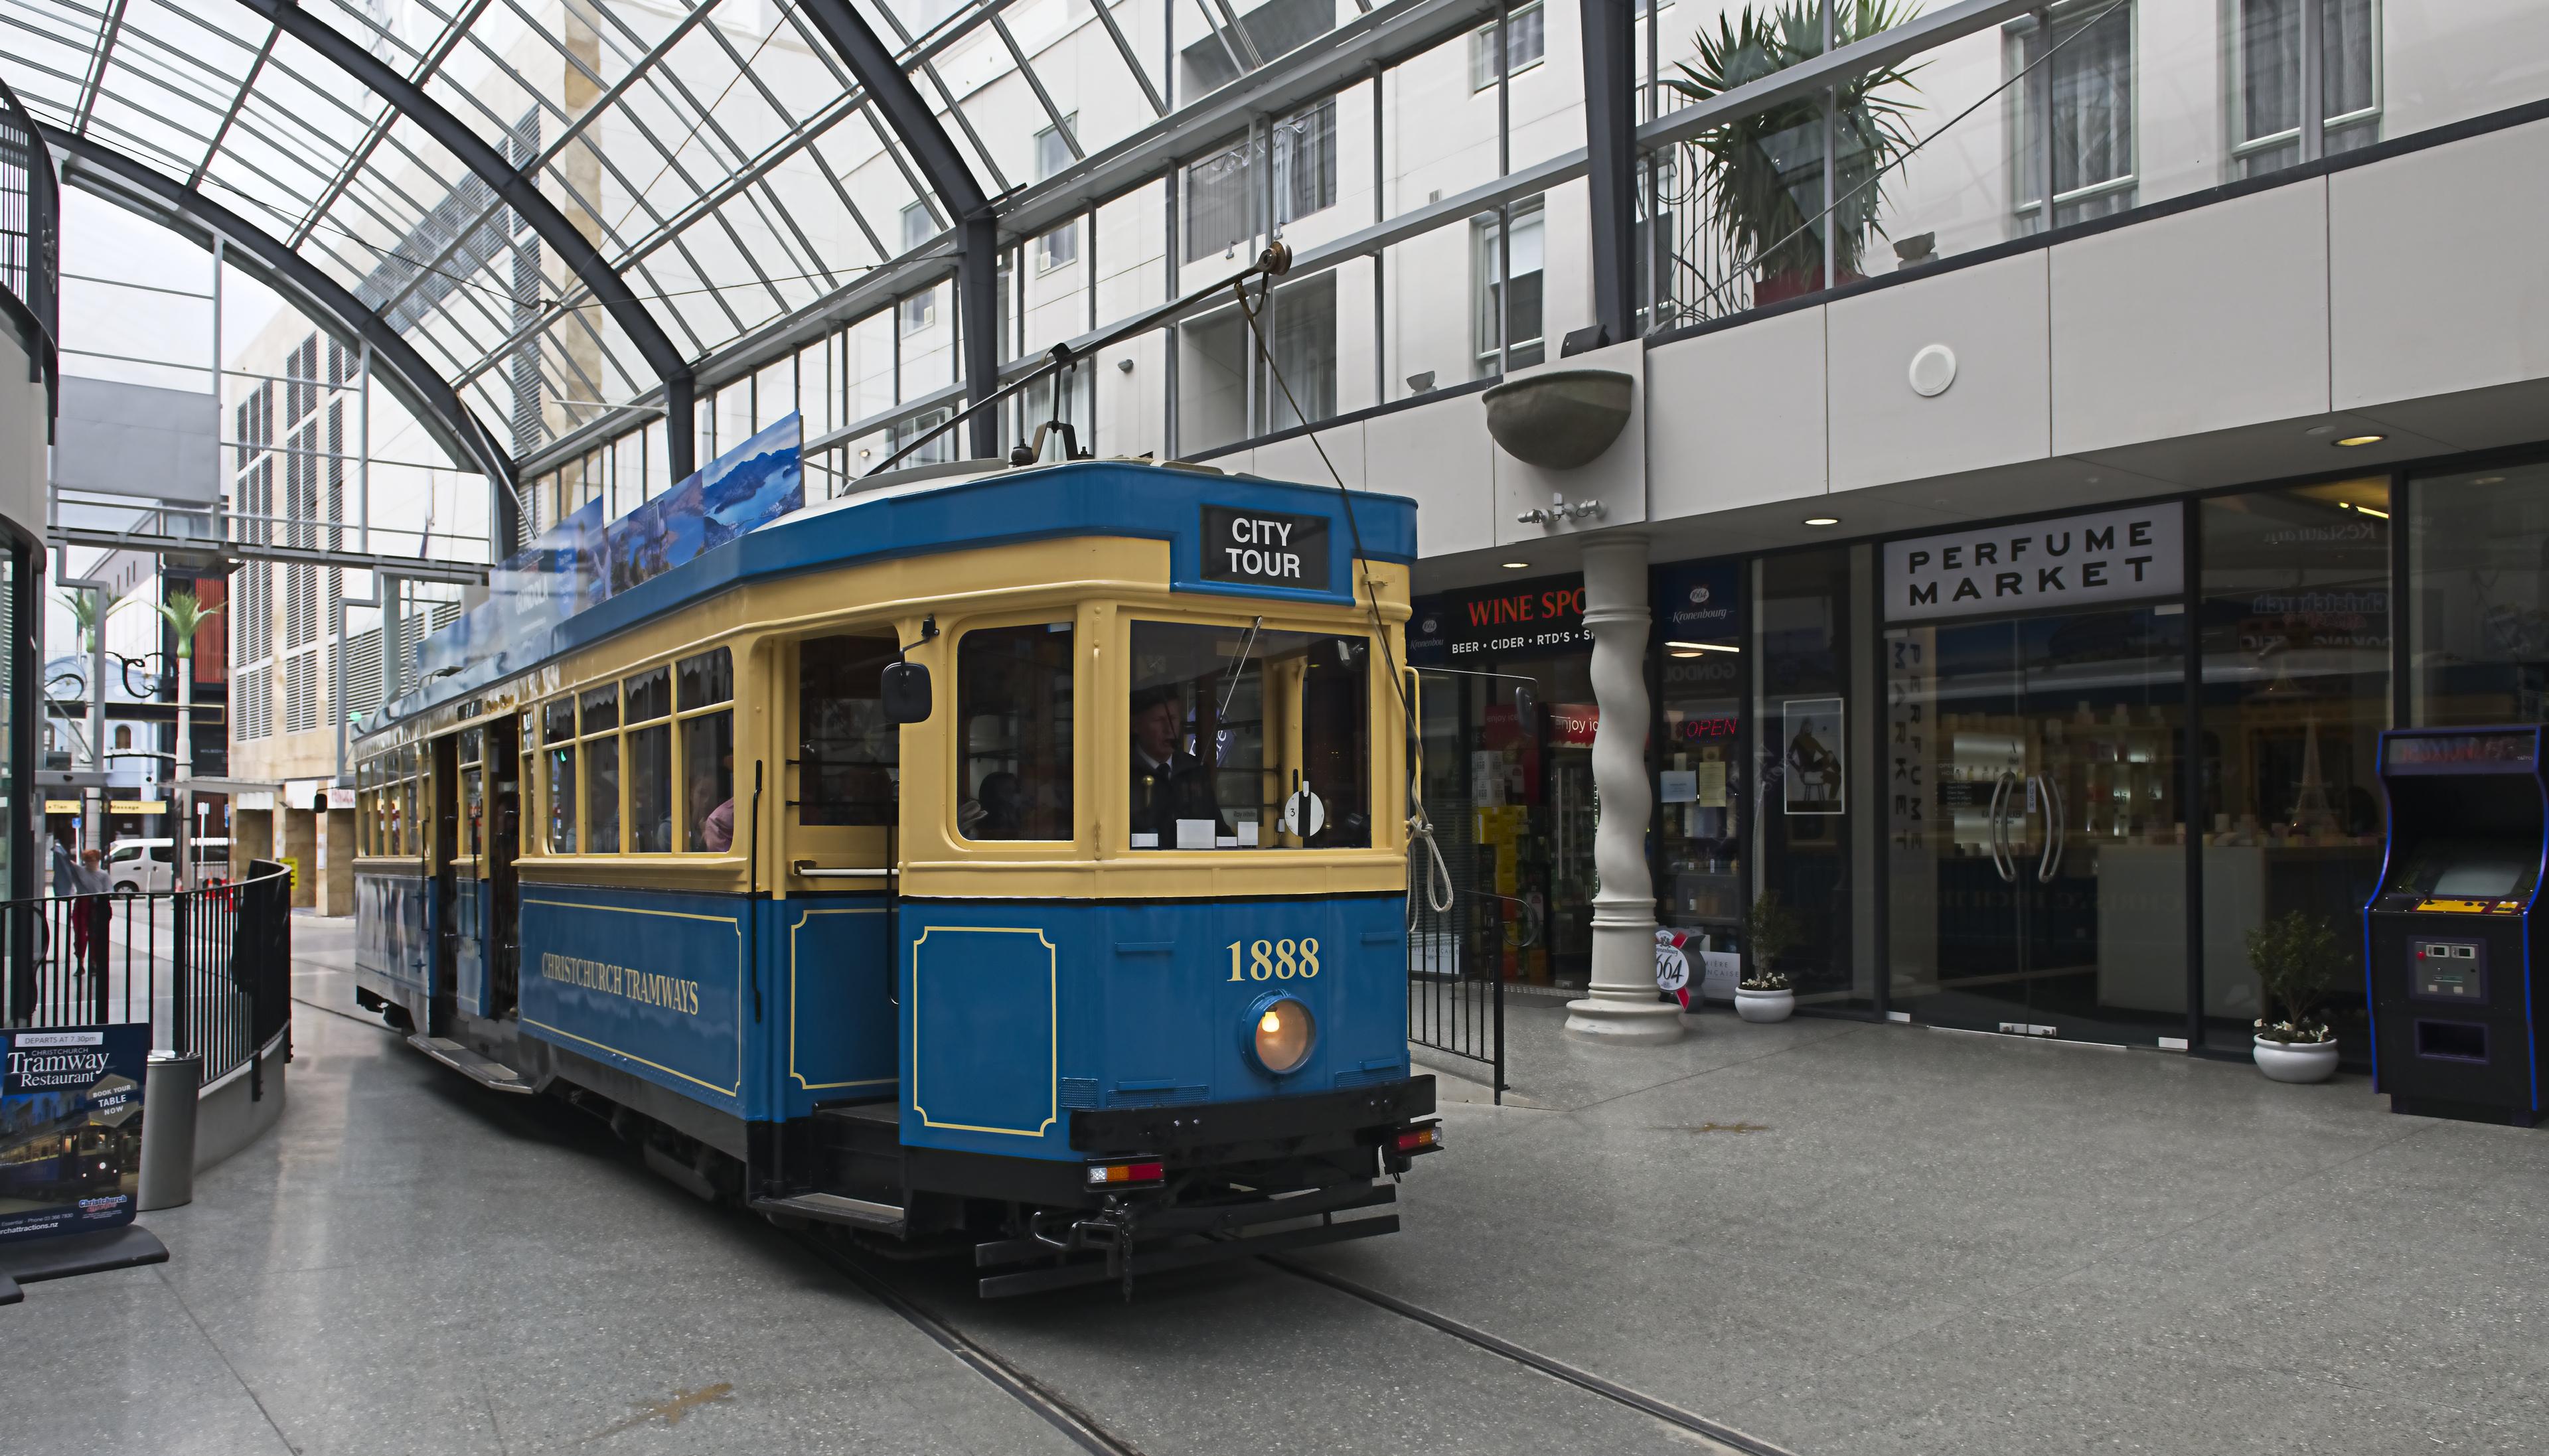 The City Tram